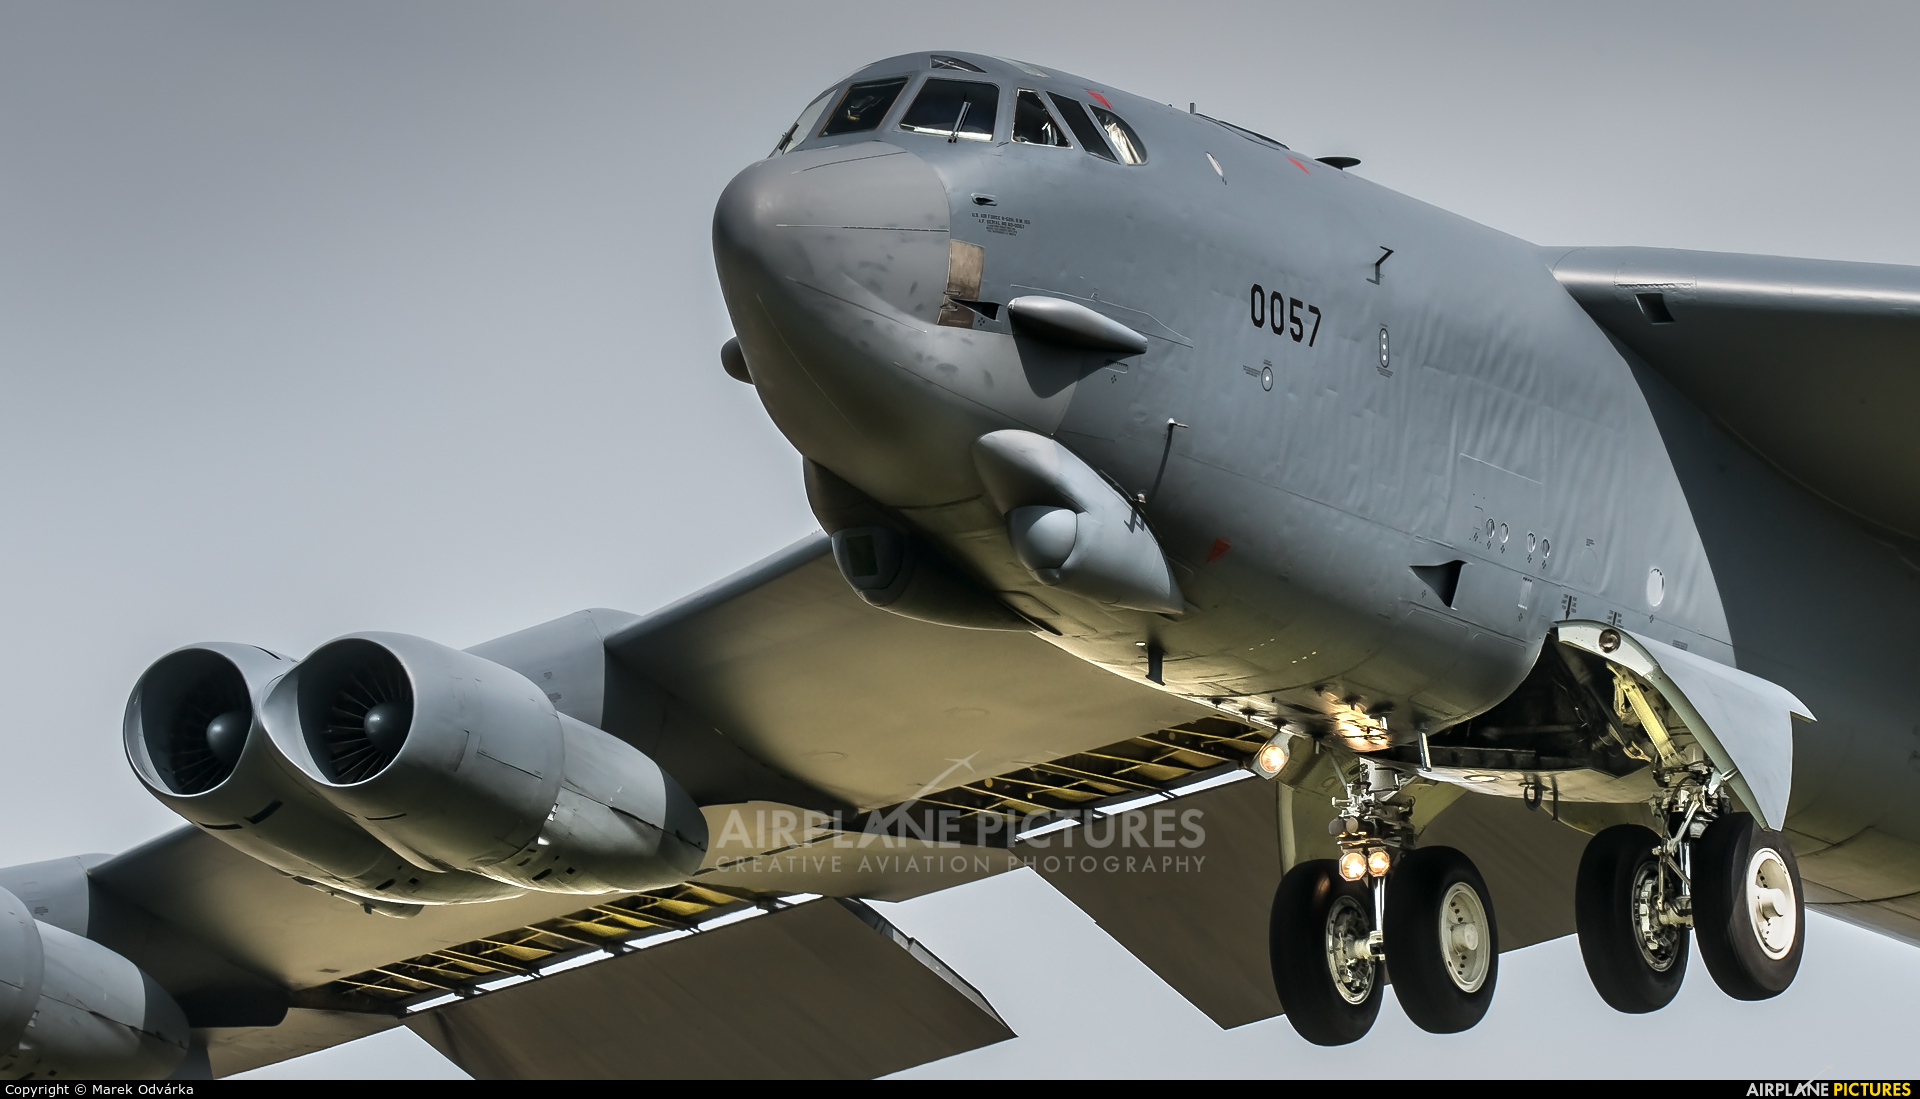 USA - Air Force AFRC 60-0057 aircraft at Ostrava Mošnov